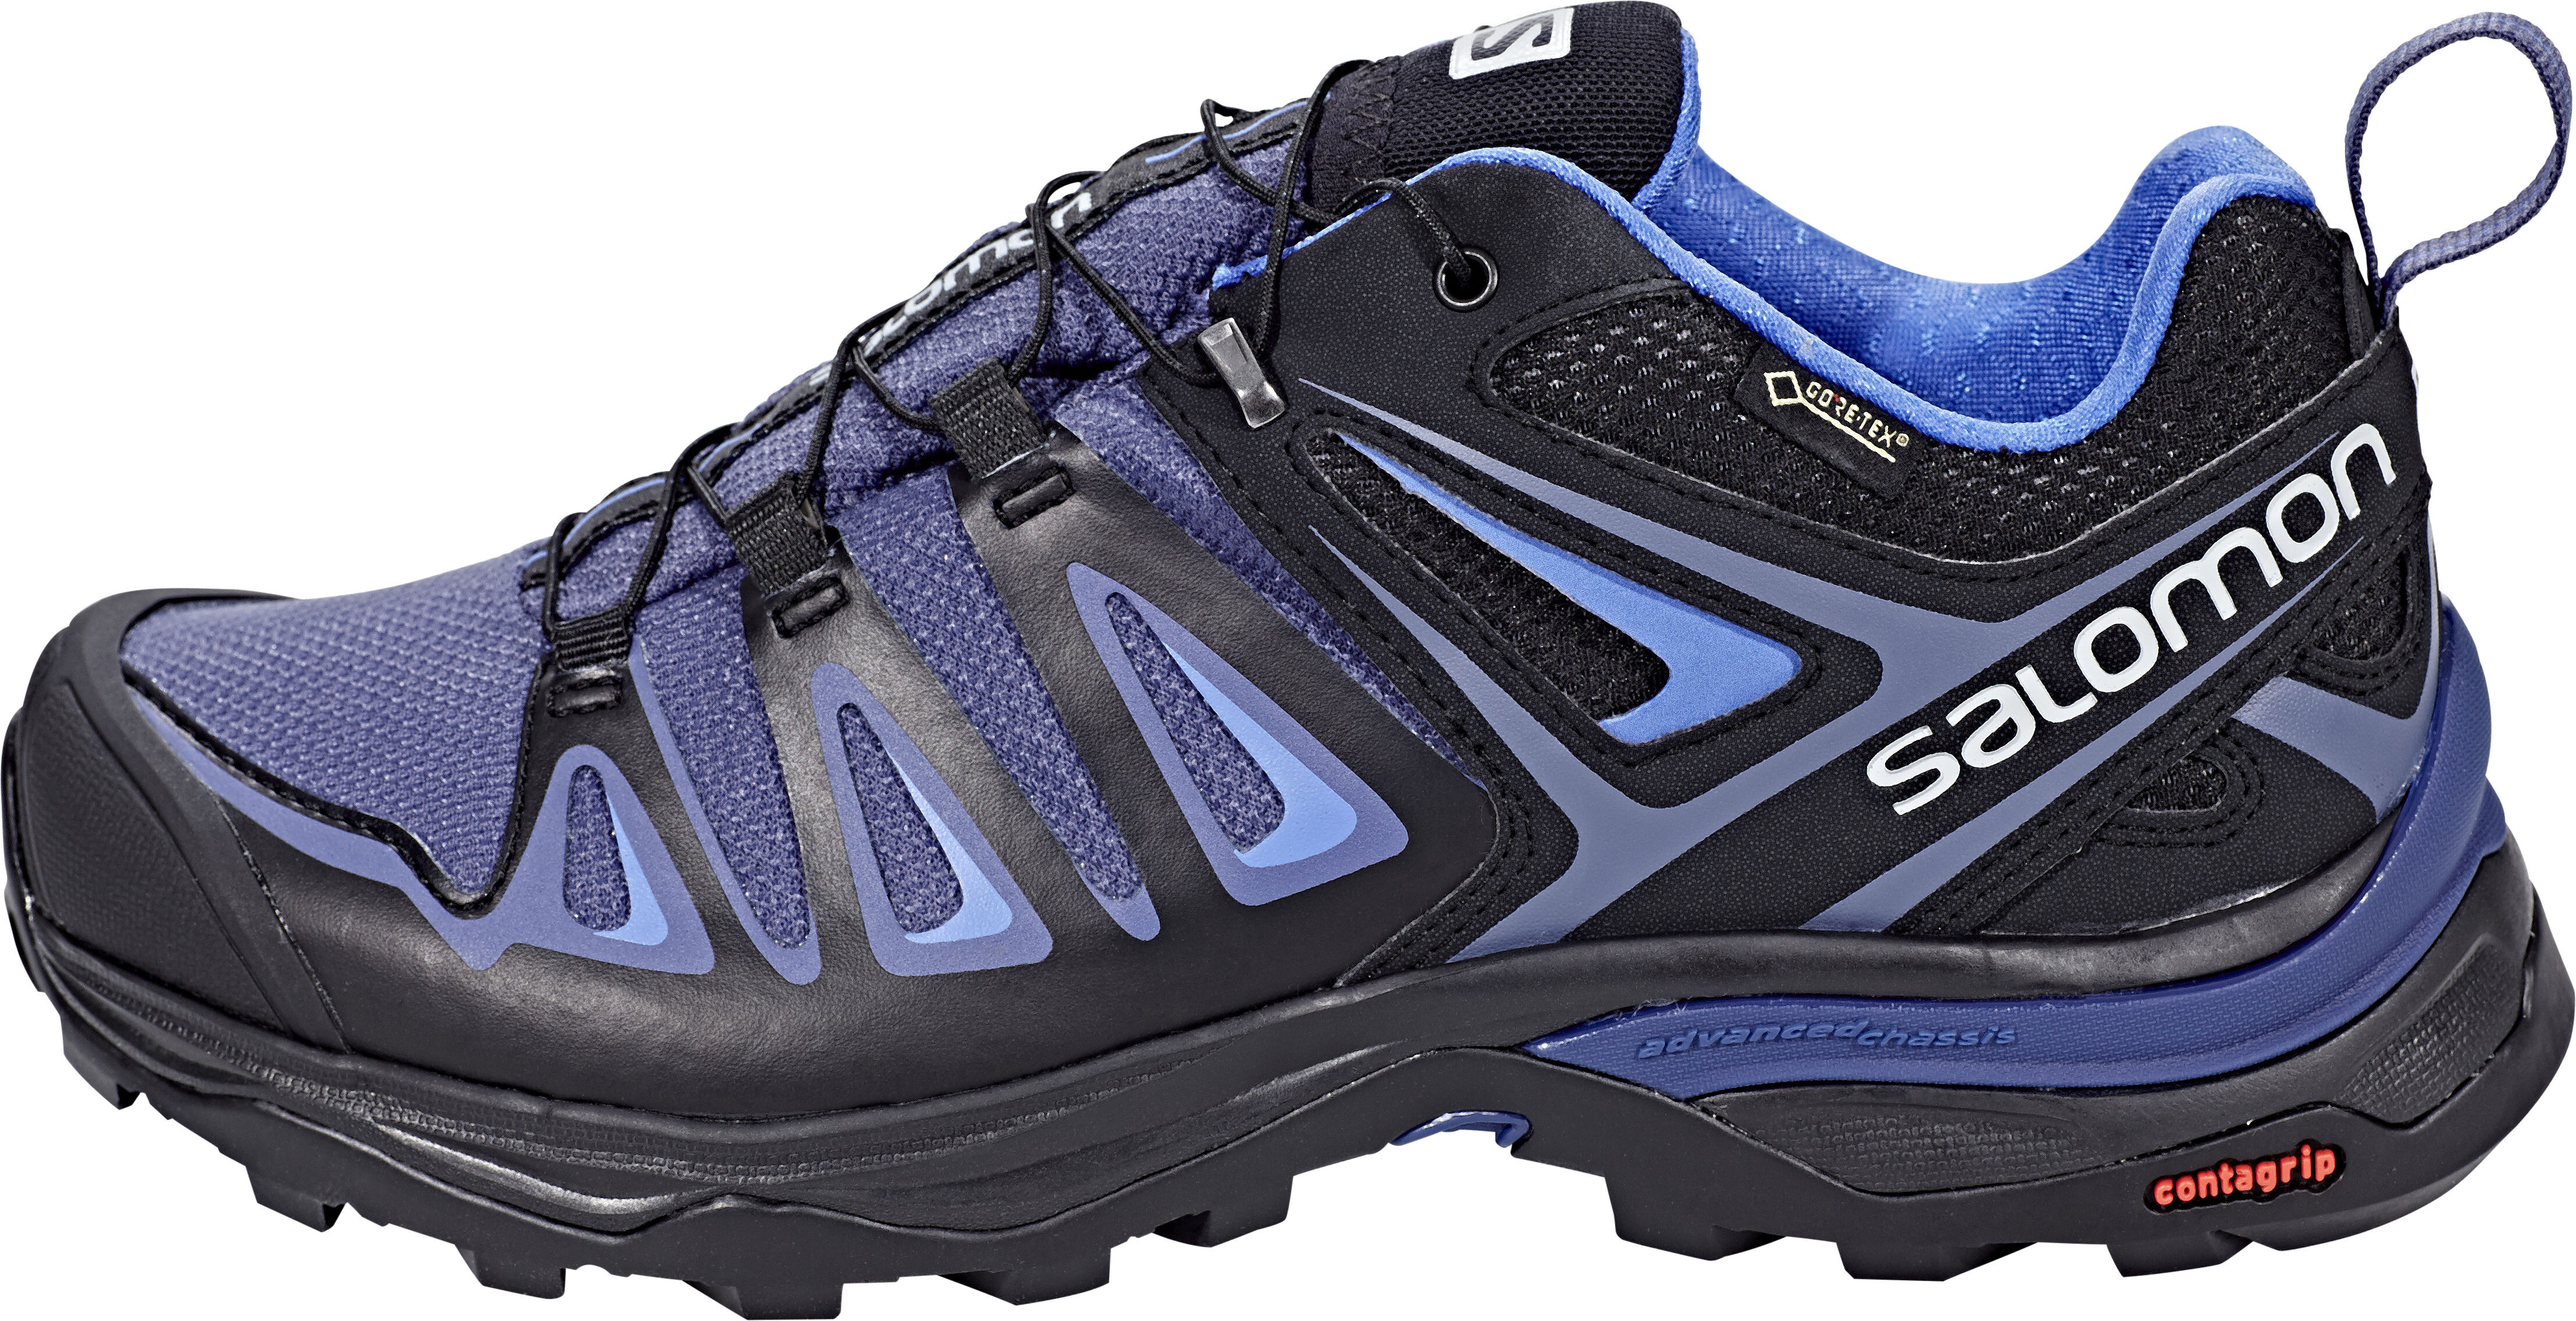 Salomon X Ultra 3 GTX Shoes Women purple black at Addnature.co.uk 4b43a99ffbf